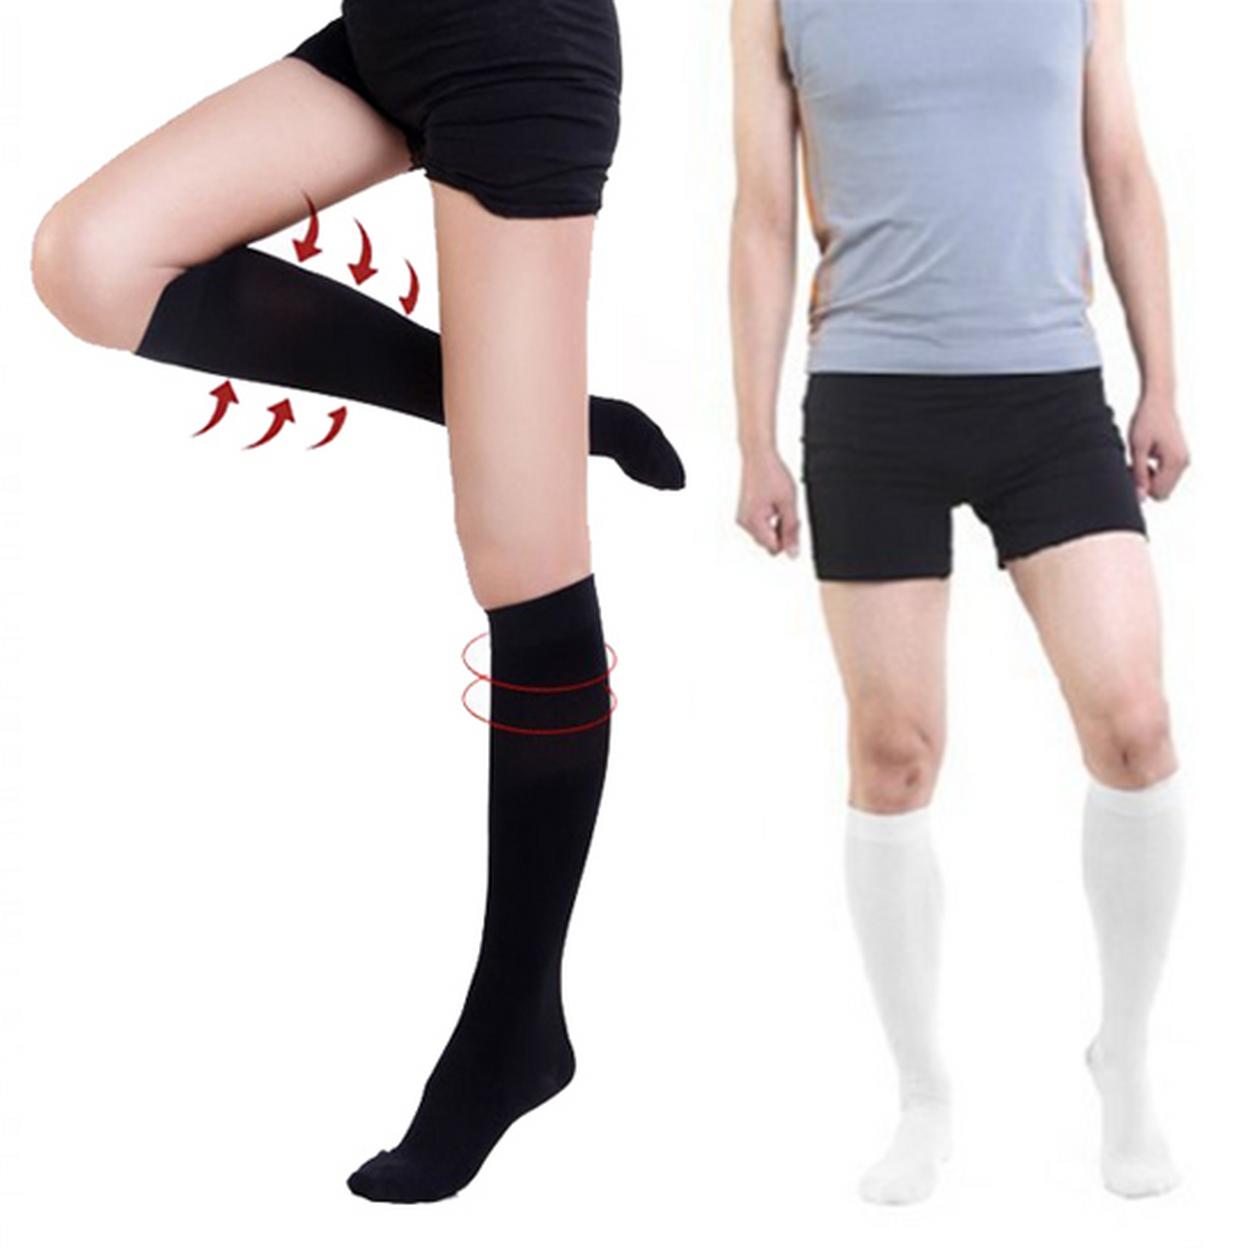 Compression Socks for Men and Women - Black, Small/Medium 57630e58483d6f2f6a8b4622